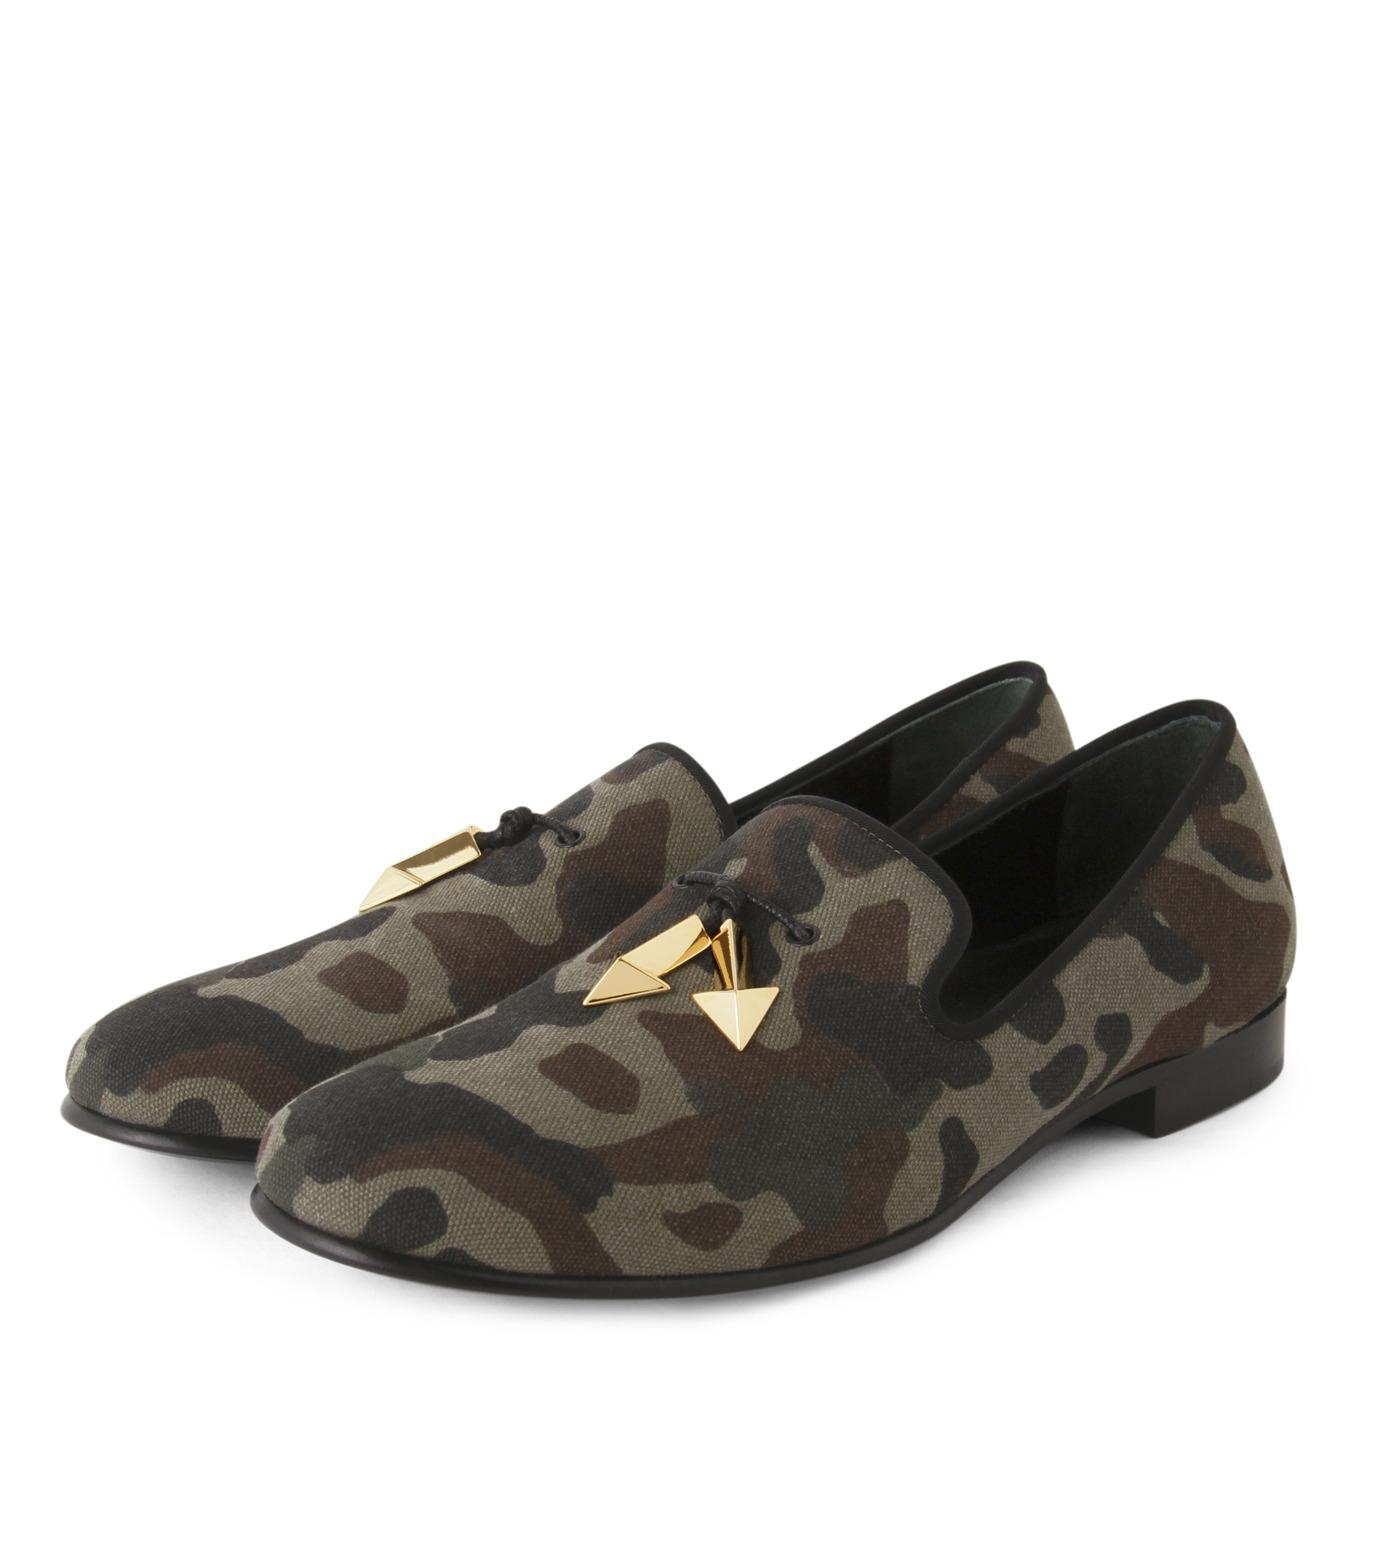 Giuseppe Zanotti Design(ジュゼッペザノッティ)のCamoflage Loafer-GREEN(シューズ/shoes)-EU5023JP-T-22 拡大詳細画像4